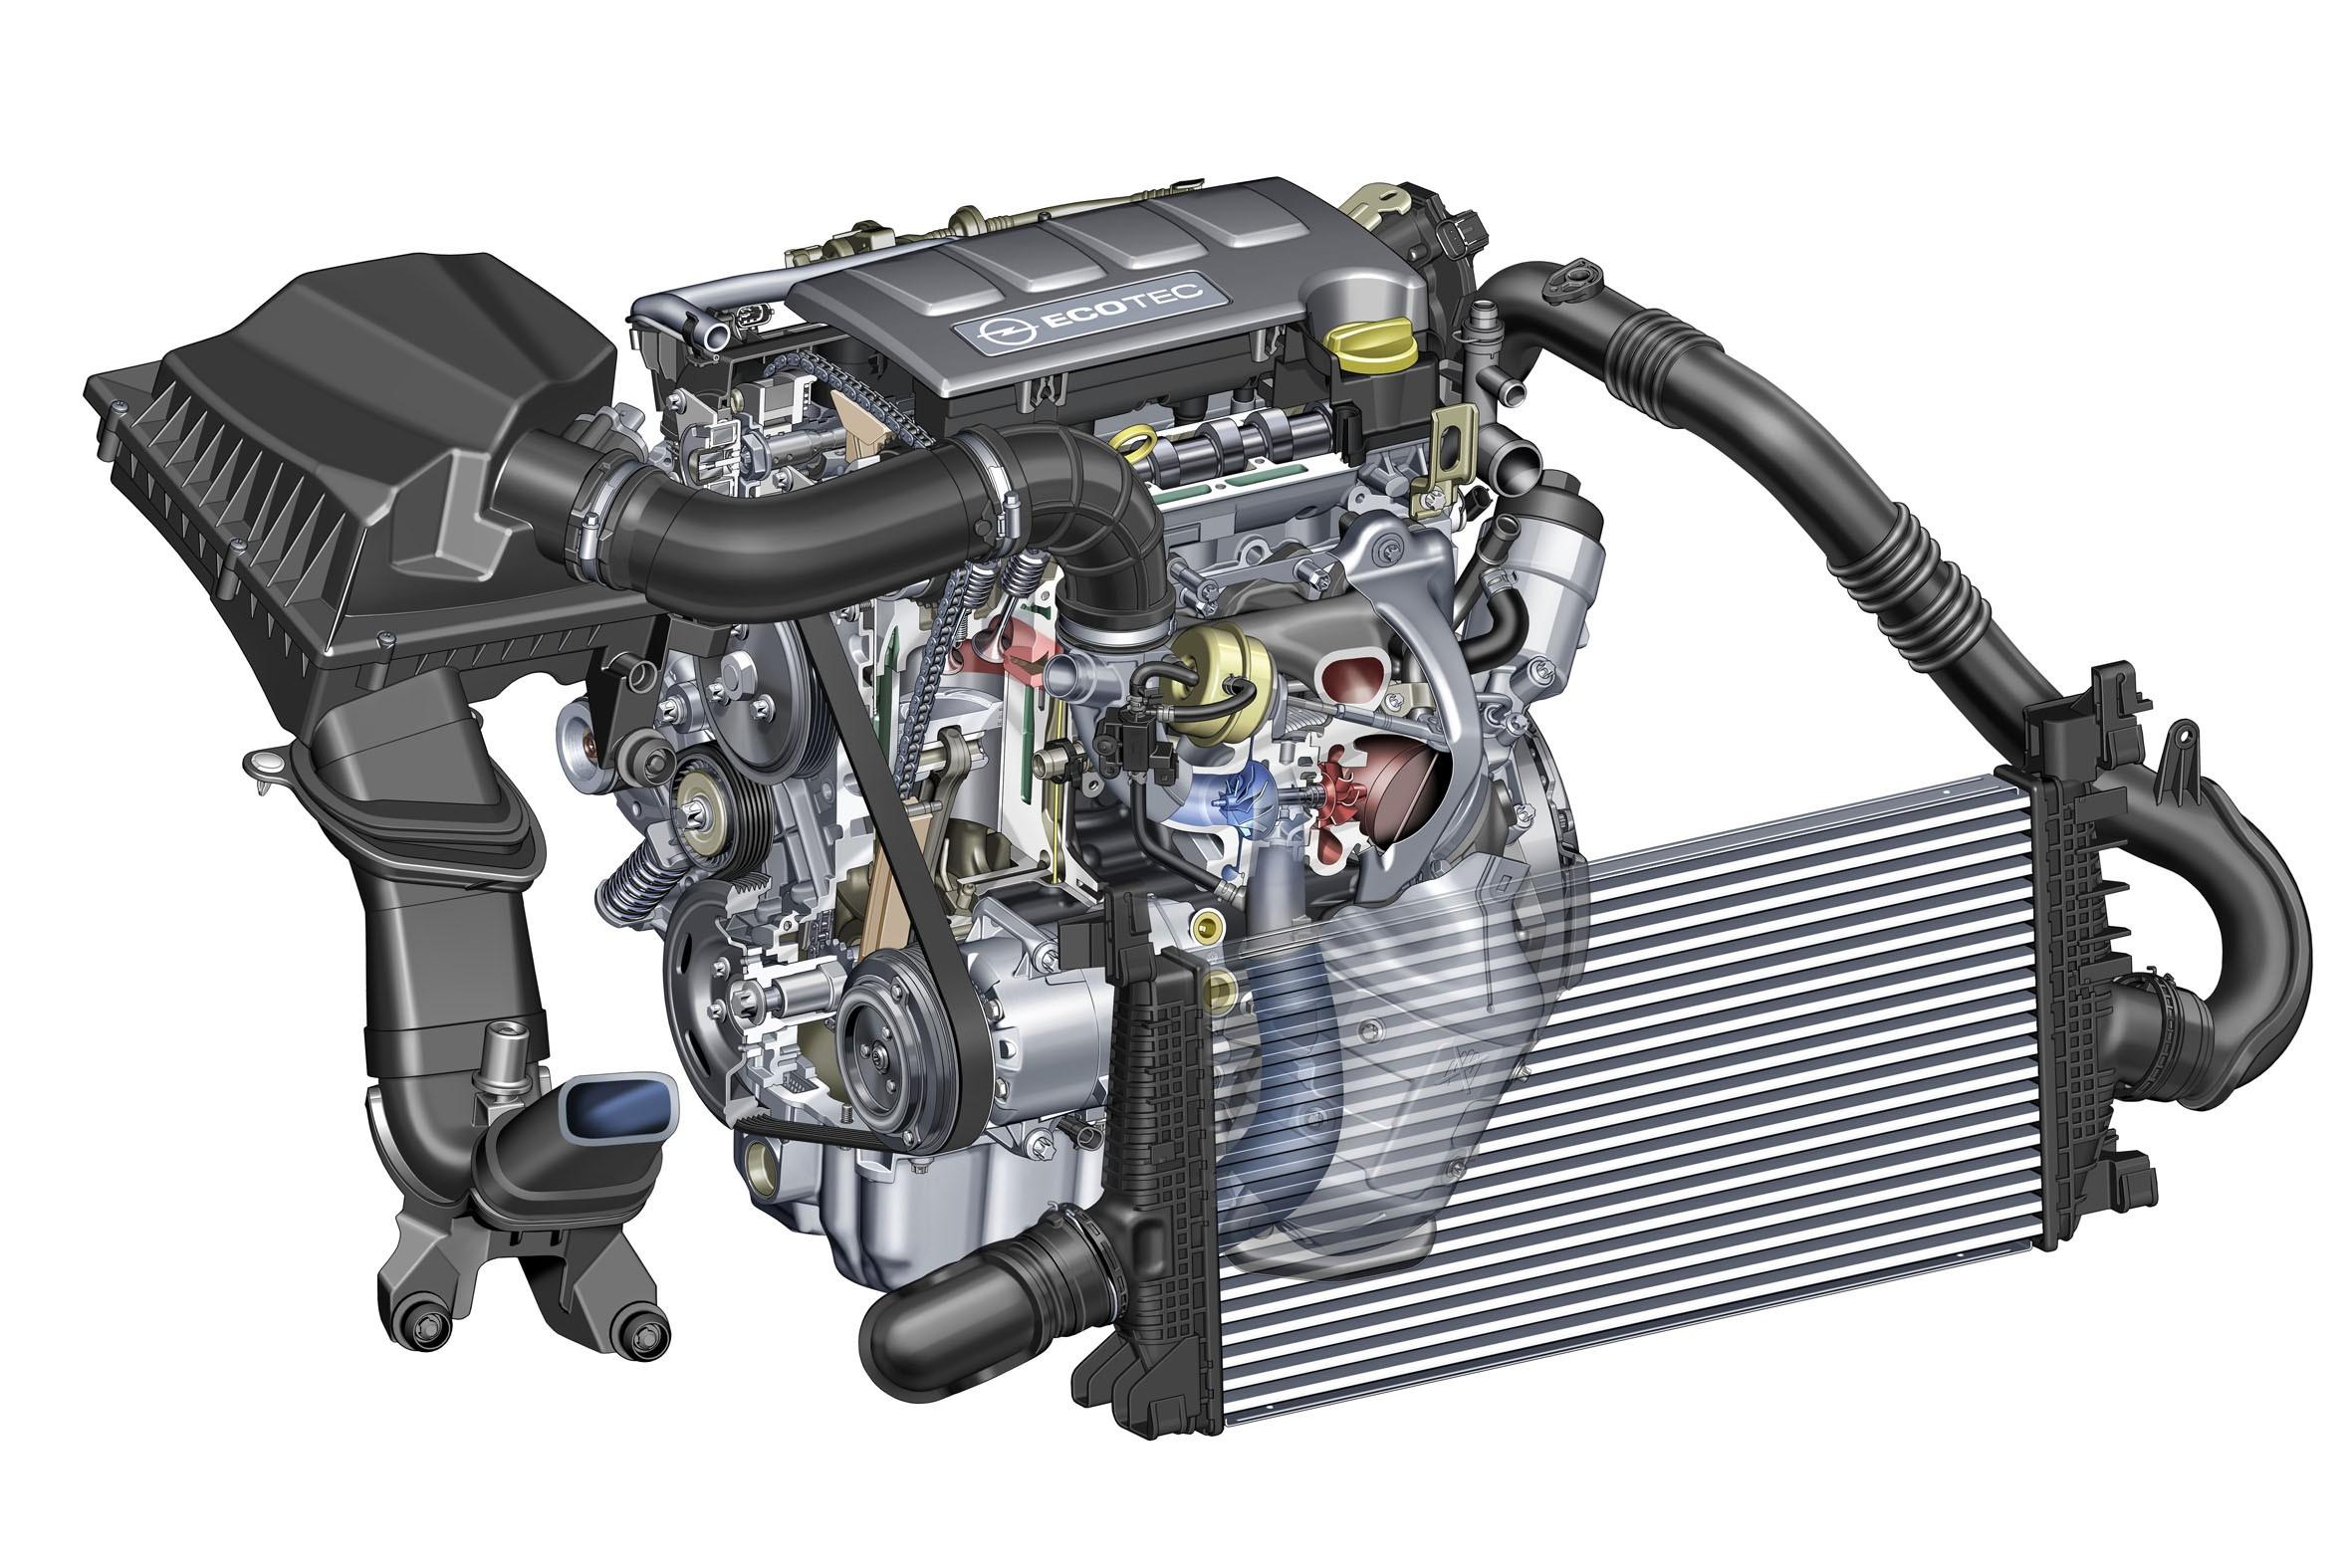 Vauxhall Corsa 1 2 Engine Diagram Opel Pressroom Europe Photos Of Vauxhall Corsa 1 2 Engine Diagram